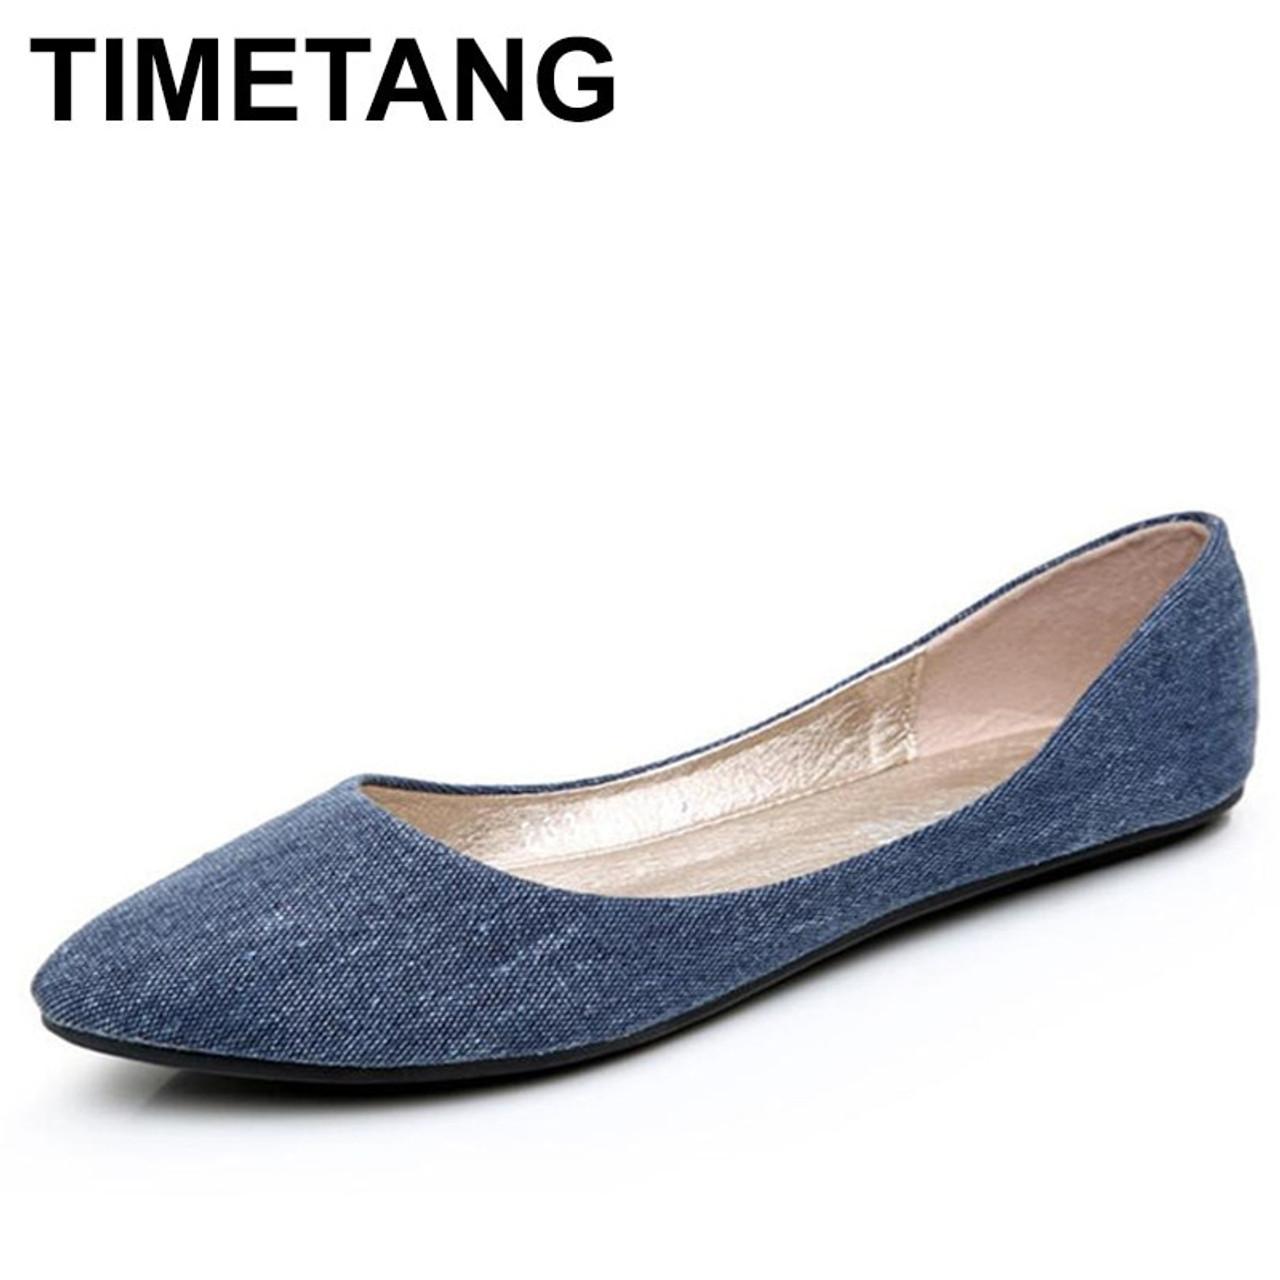 6304d0c07ec9d TIMETANG New Women Soft Denim Flats Blue Fashion High Quality Basic Pointy  Toe Ballerina Ballet Flat Slip On Office Shoes